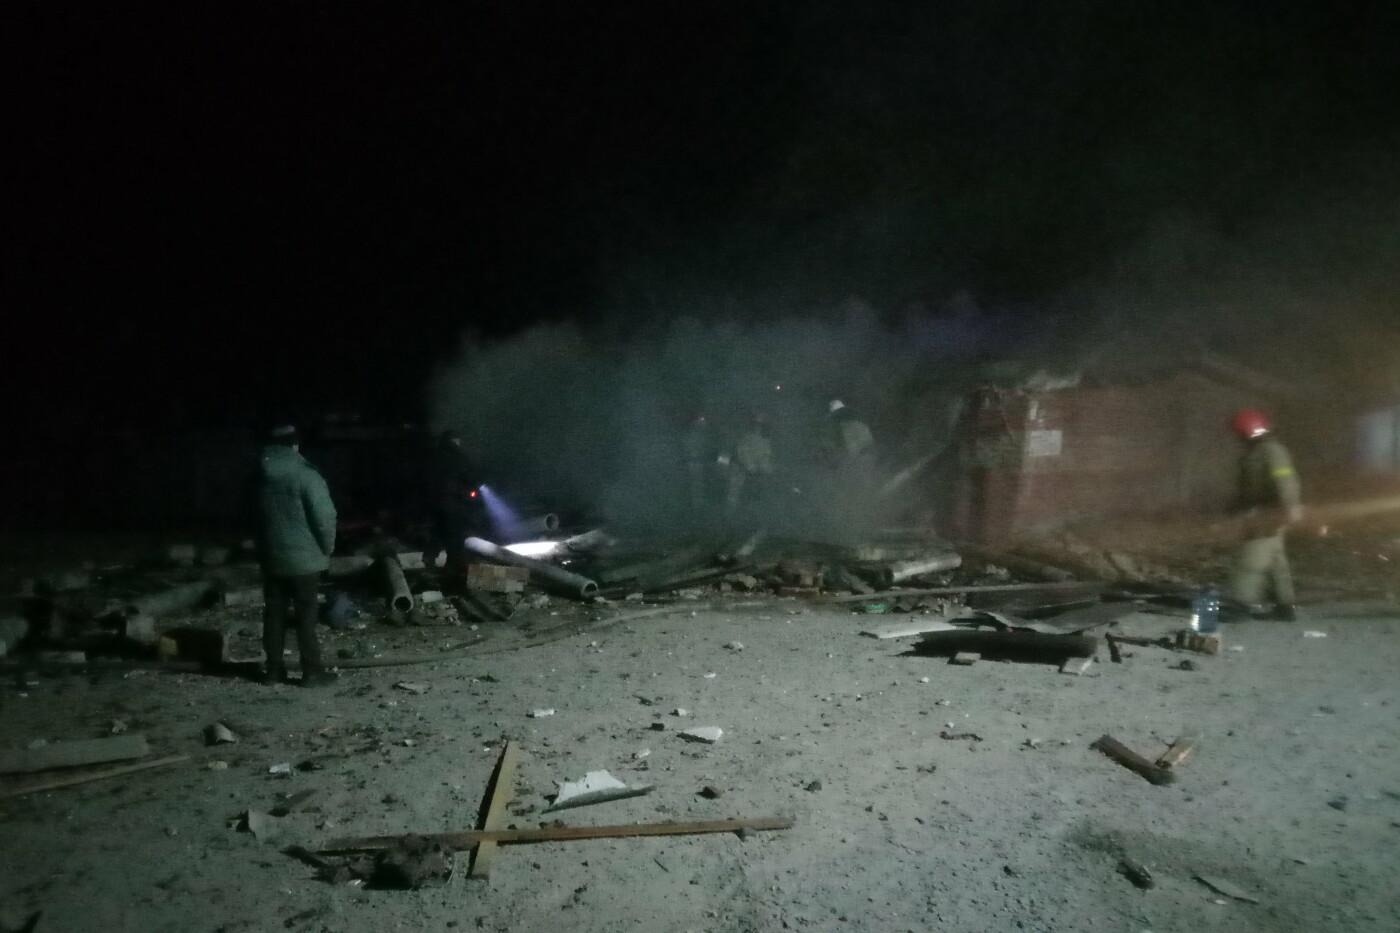 На Харьковщине из-за поджога гаражного кооператива произошел взрыв, - ФОТО, фото-1